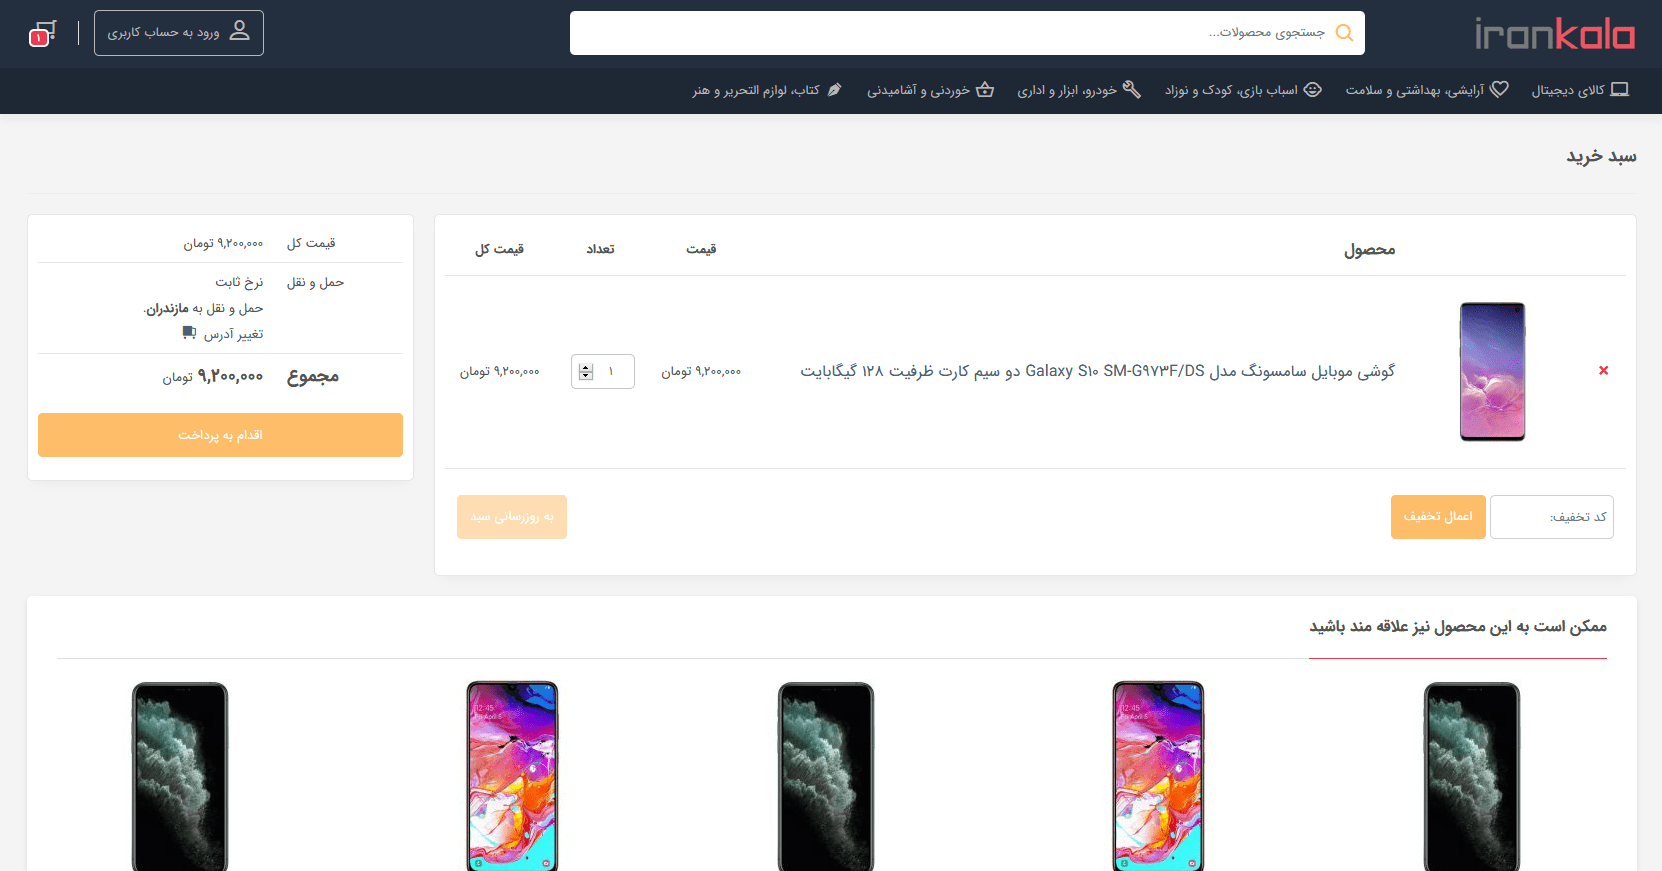 Screenshot_2020-08-22 سبد خرید – فروشگاه اینترنتی ایرانکالا